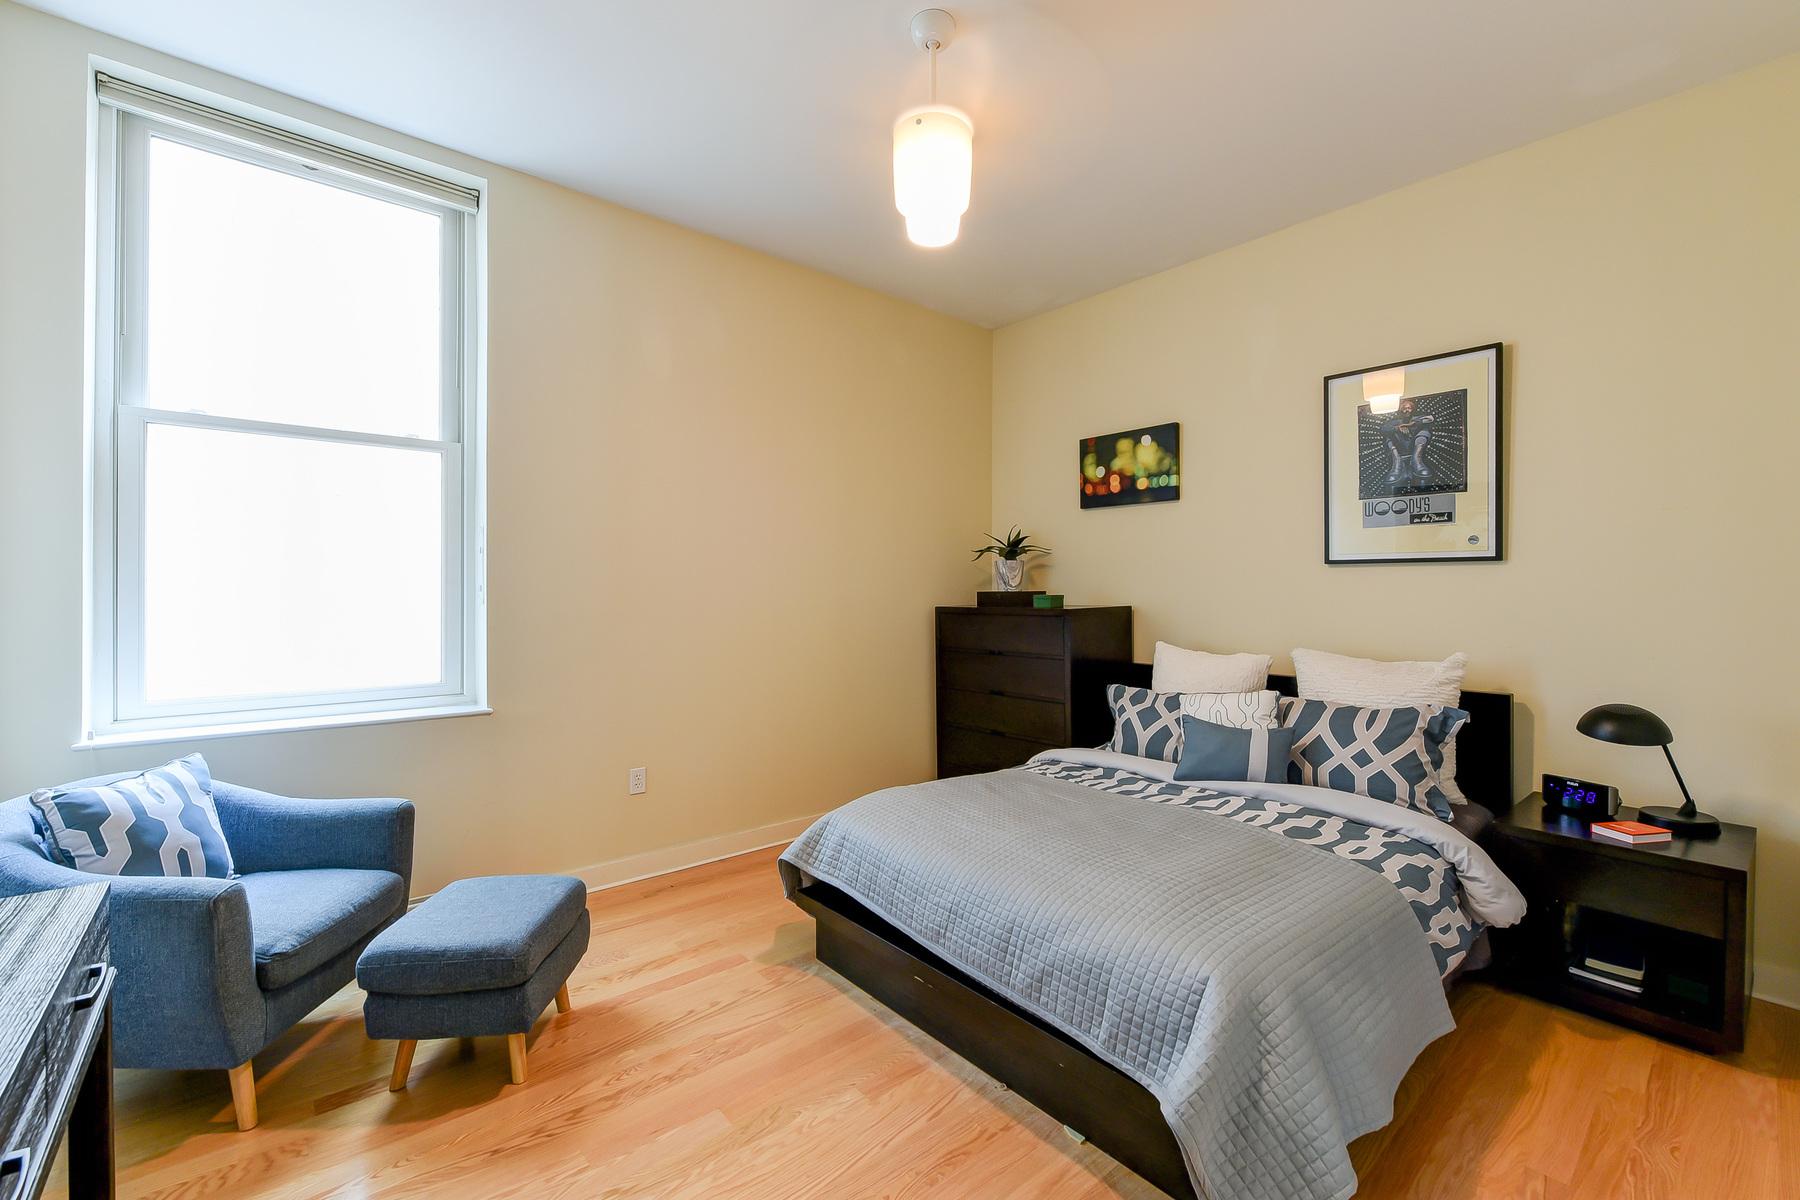 Condominium for Sale at 675 E Street Nw 350, Washington Washington, District Of Columbia, 20004 United States